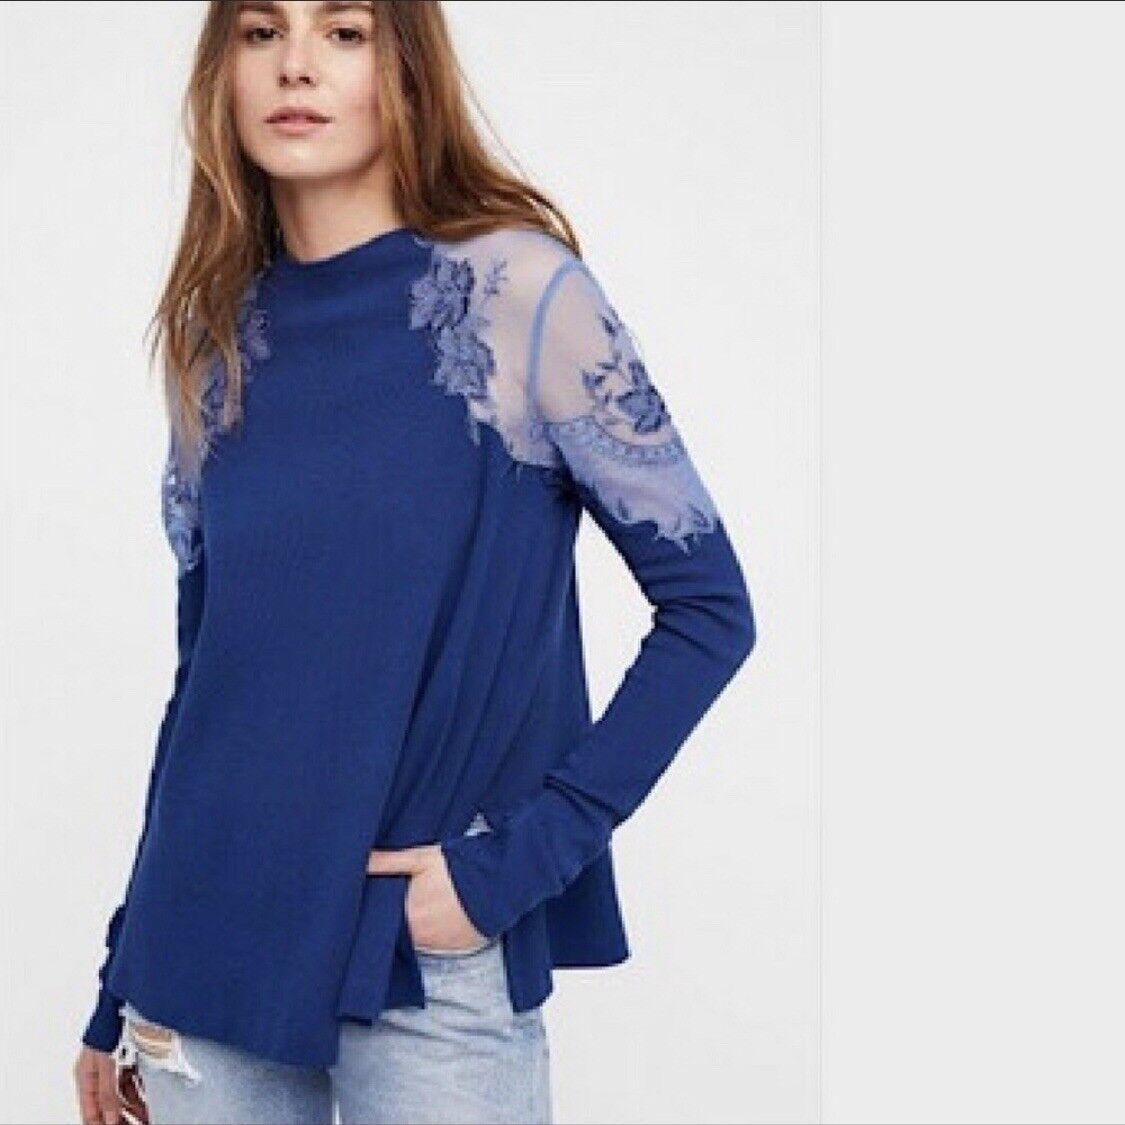 NWT Free People Daniella Embroiderot Illusion Top Sz Small S Blau